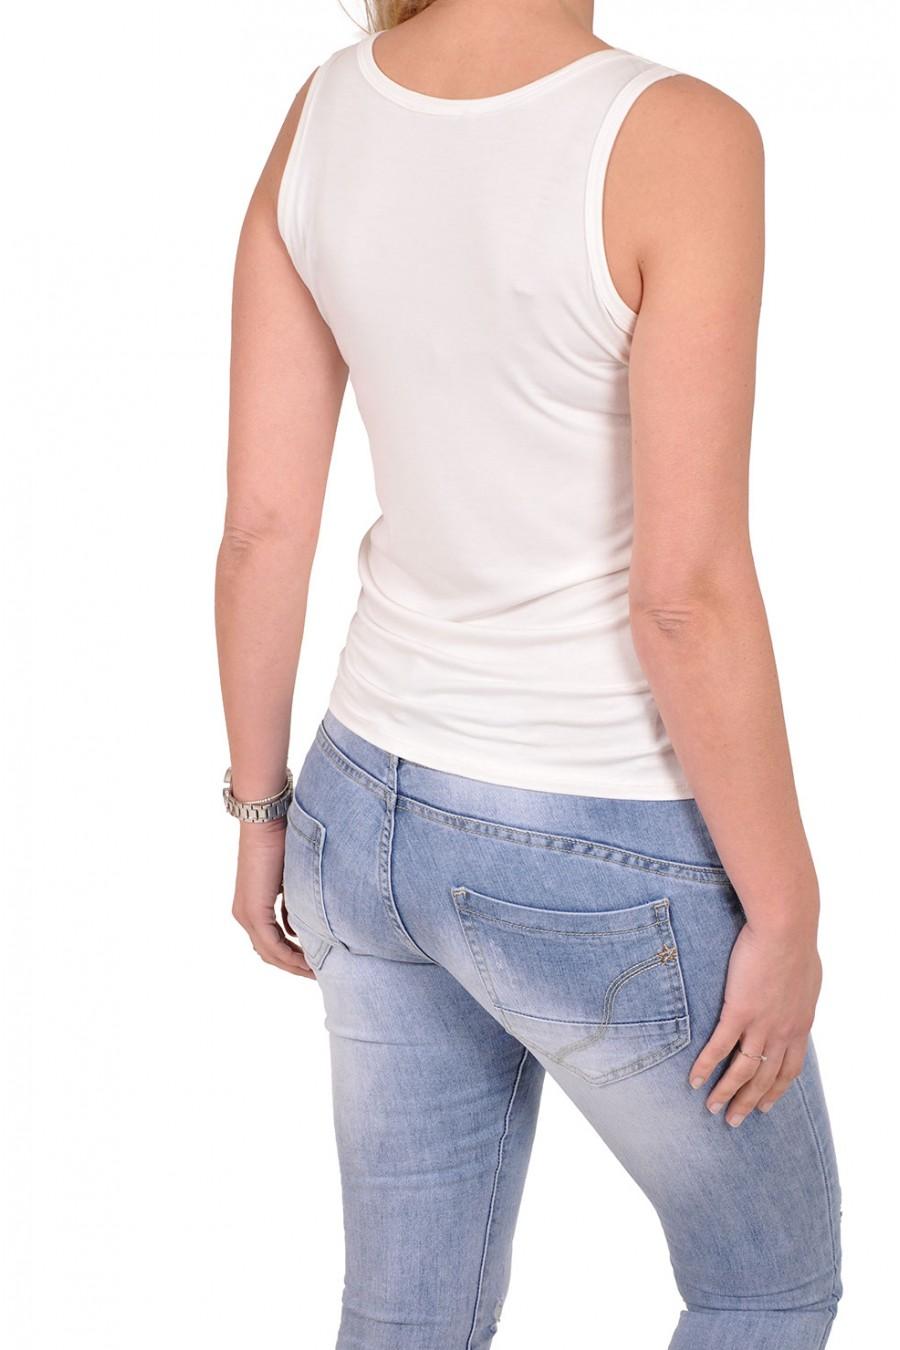 Basic topje want-it off white Italia Moda